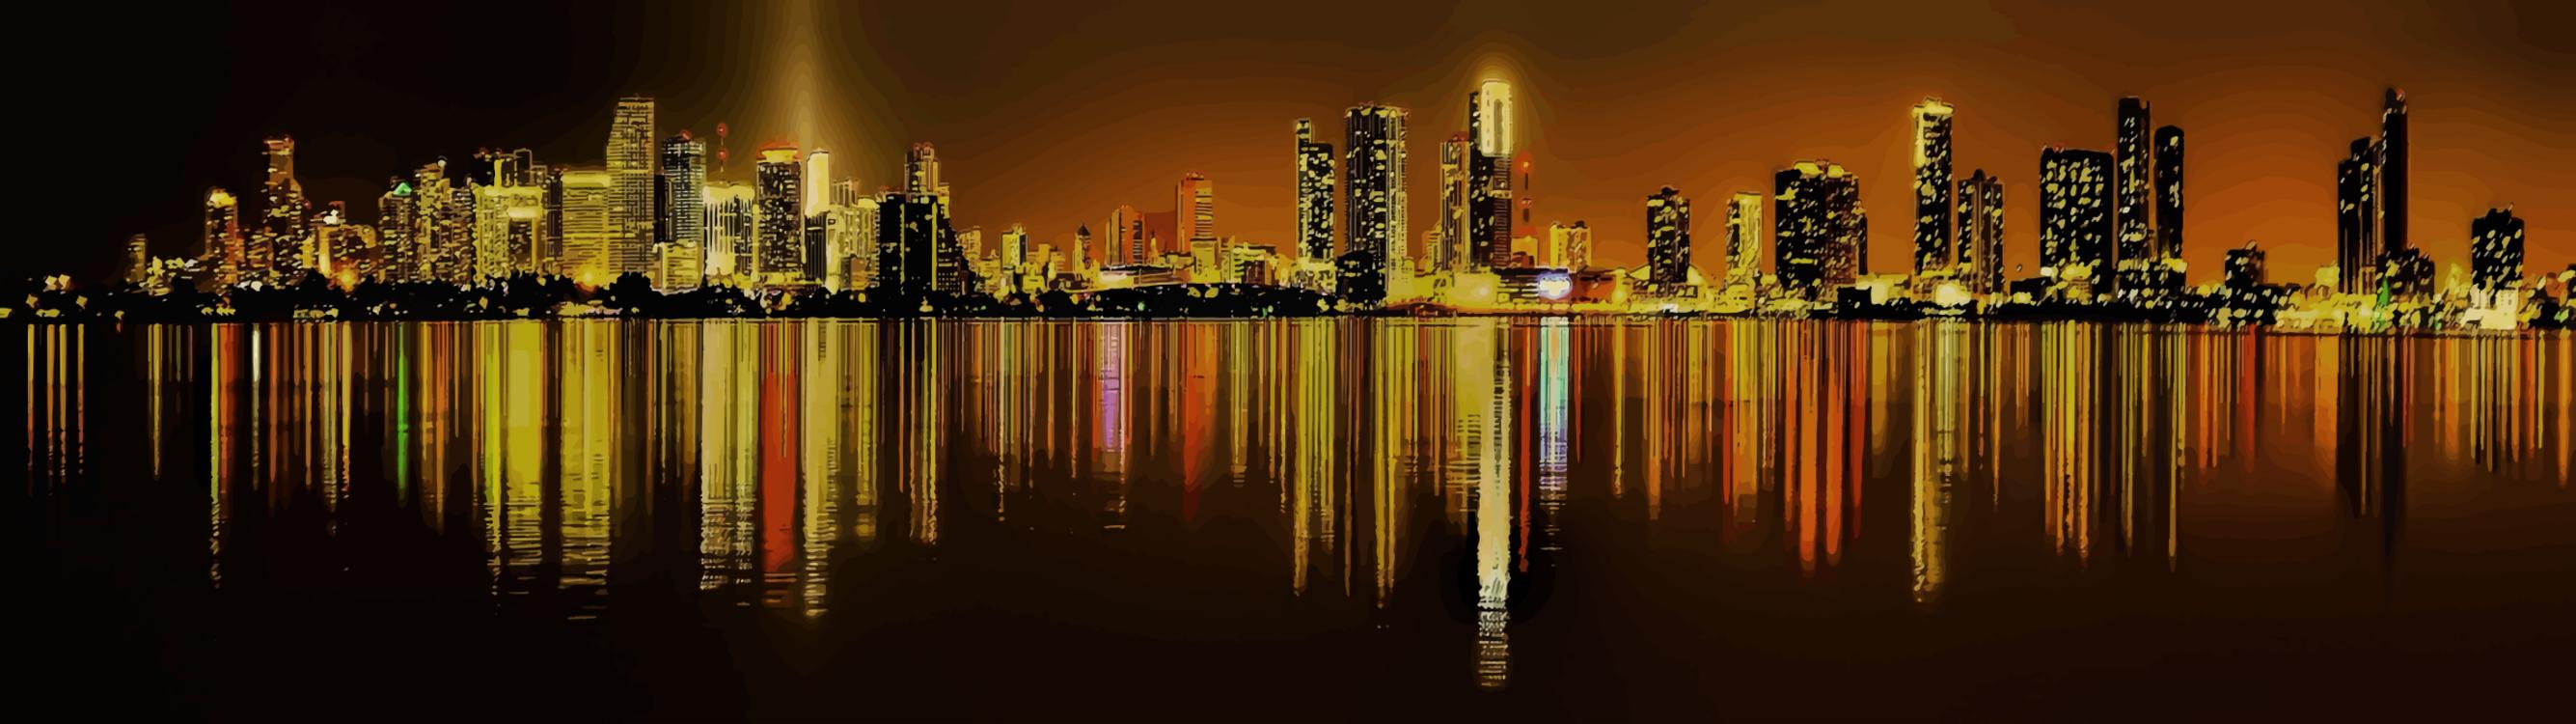 City,Metropolis,Evening